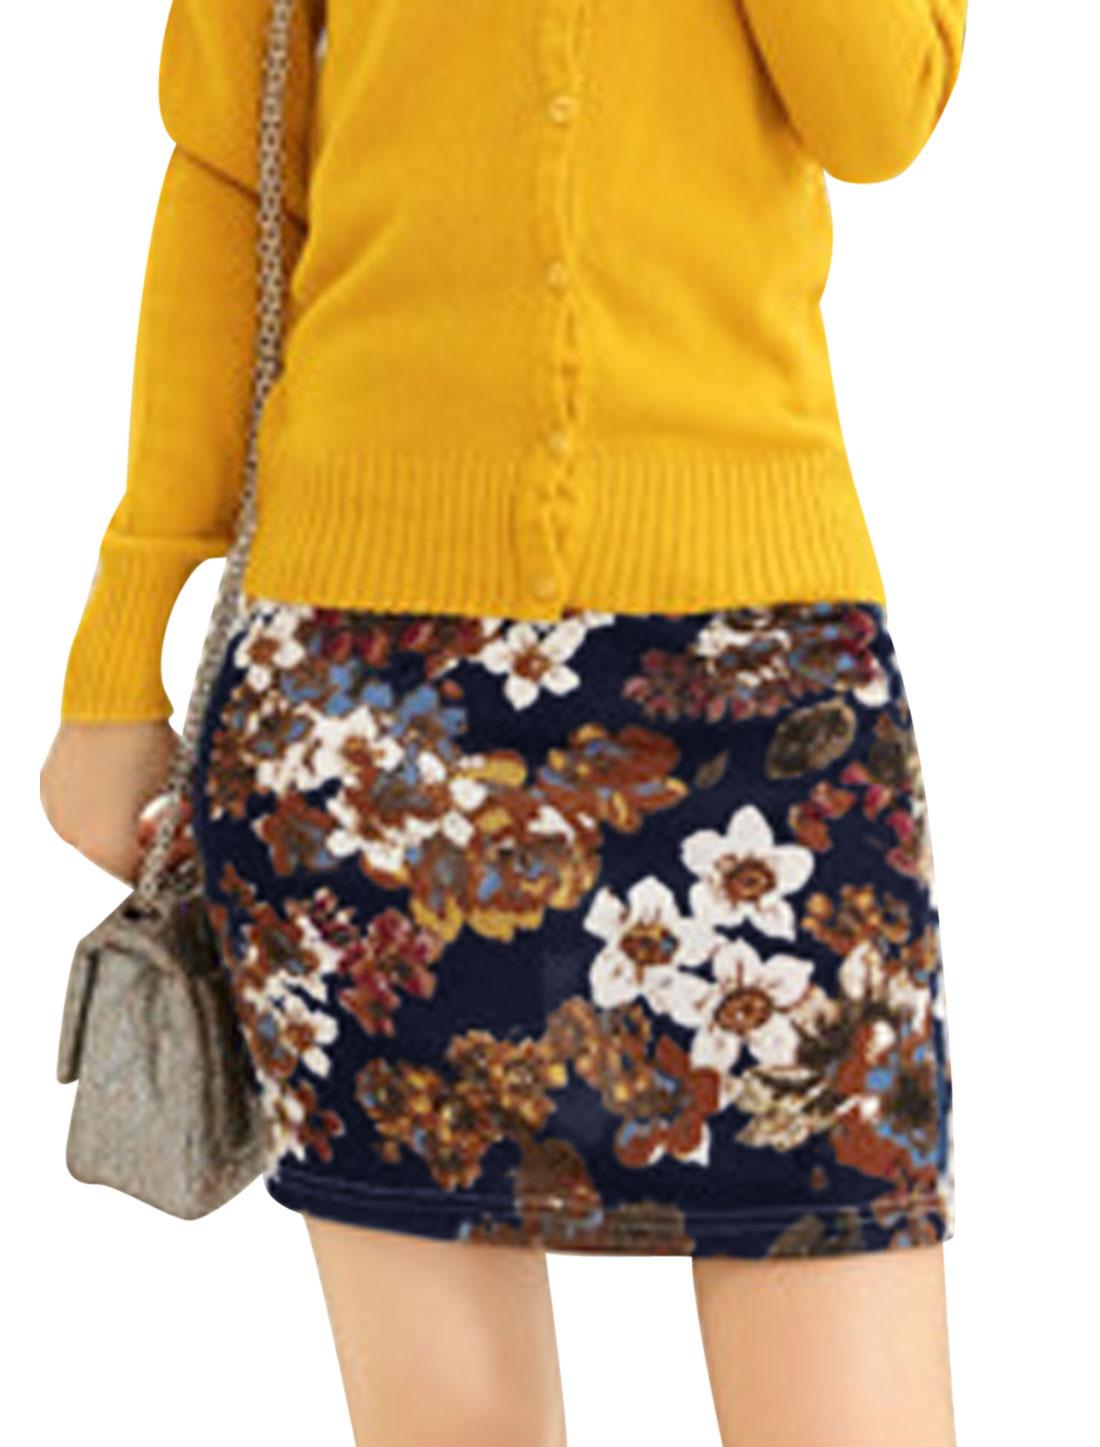 Women Natural Waist Floral Prints Fashion Mini Skirt Navy Blue XS